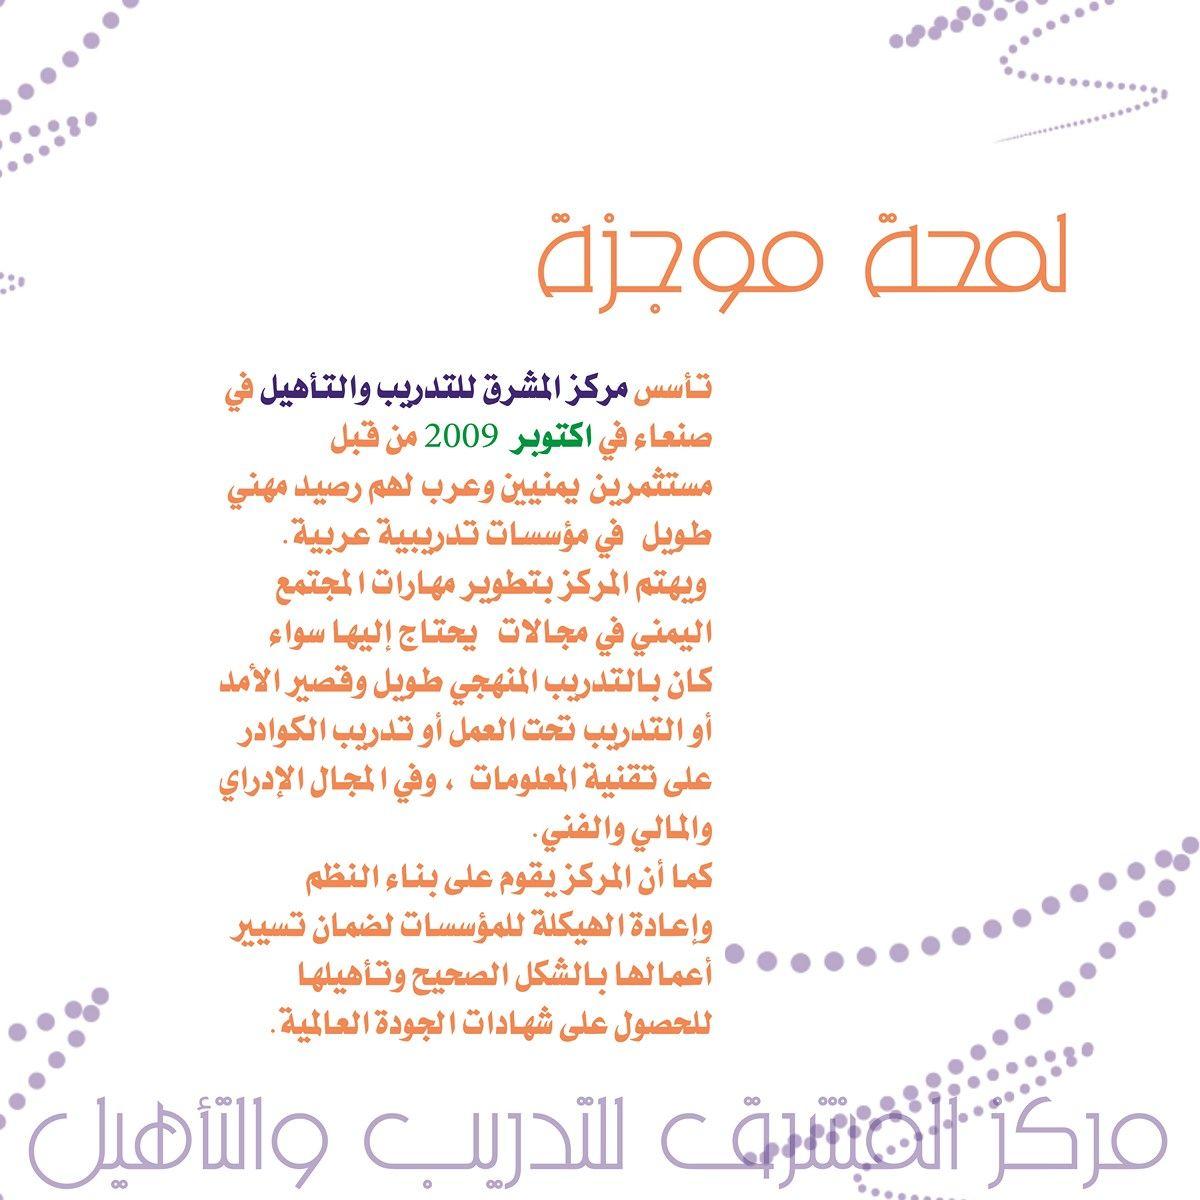 Pin By عبدالله المخلافي On ملفات Word Search Puzzle Words Word Search